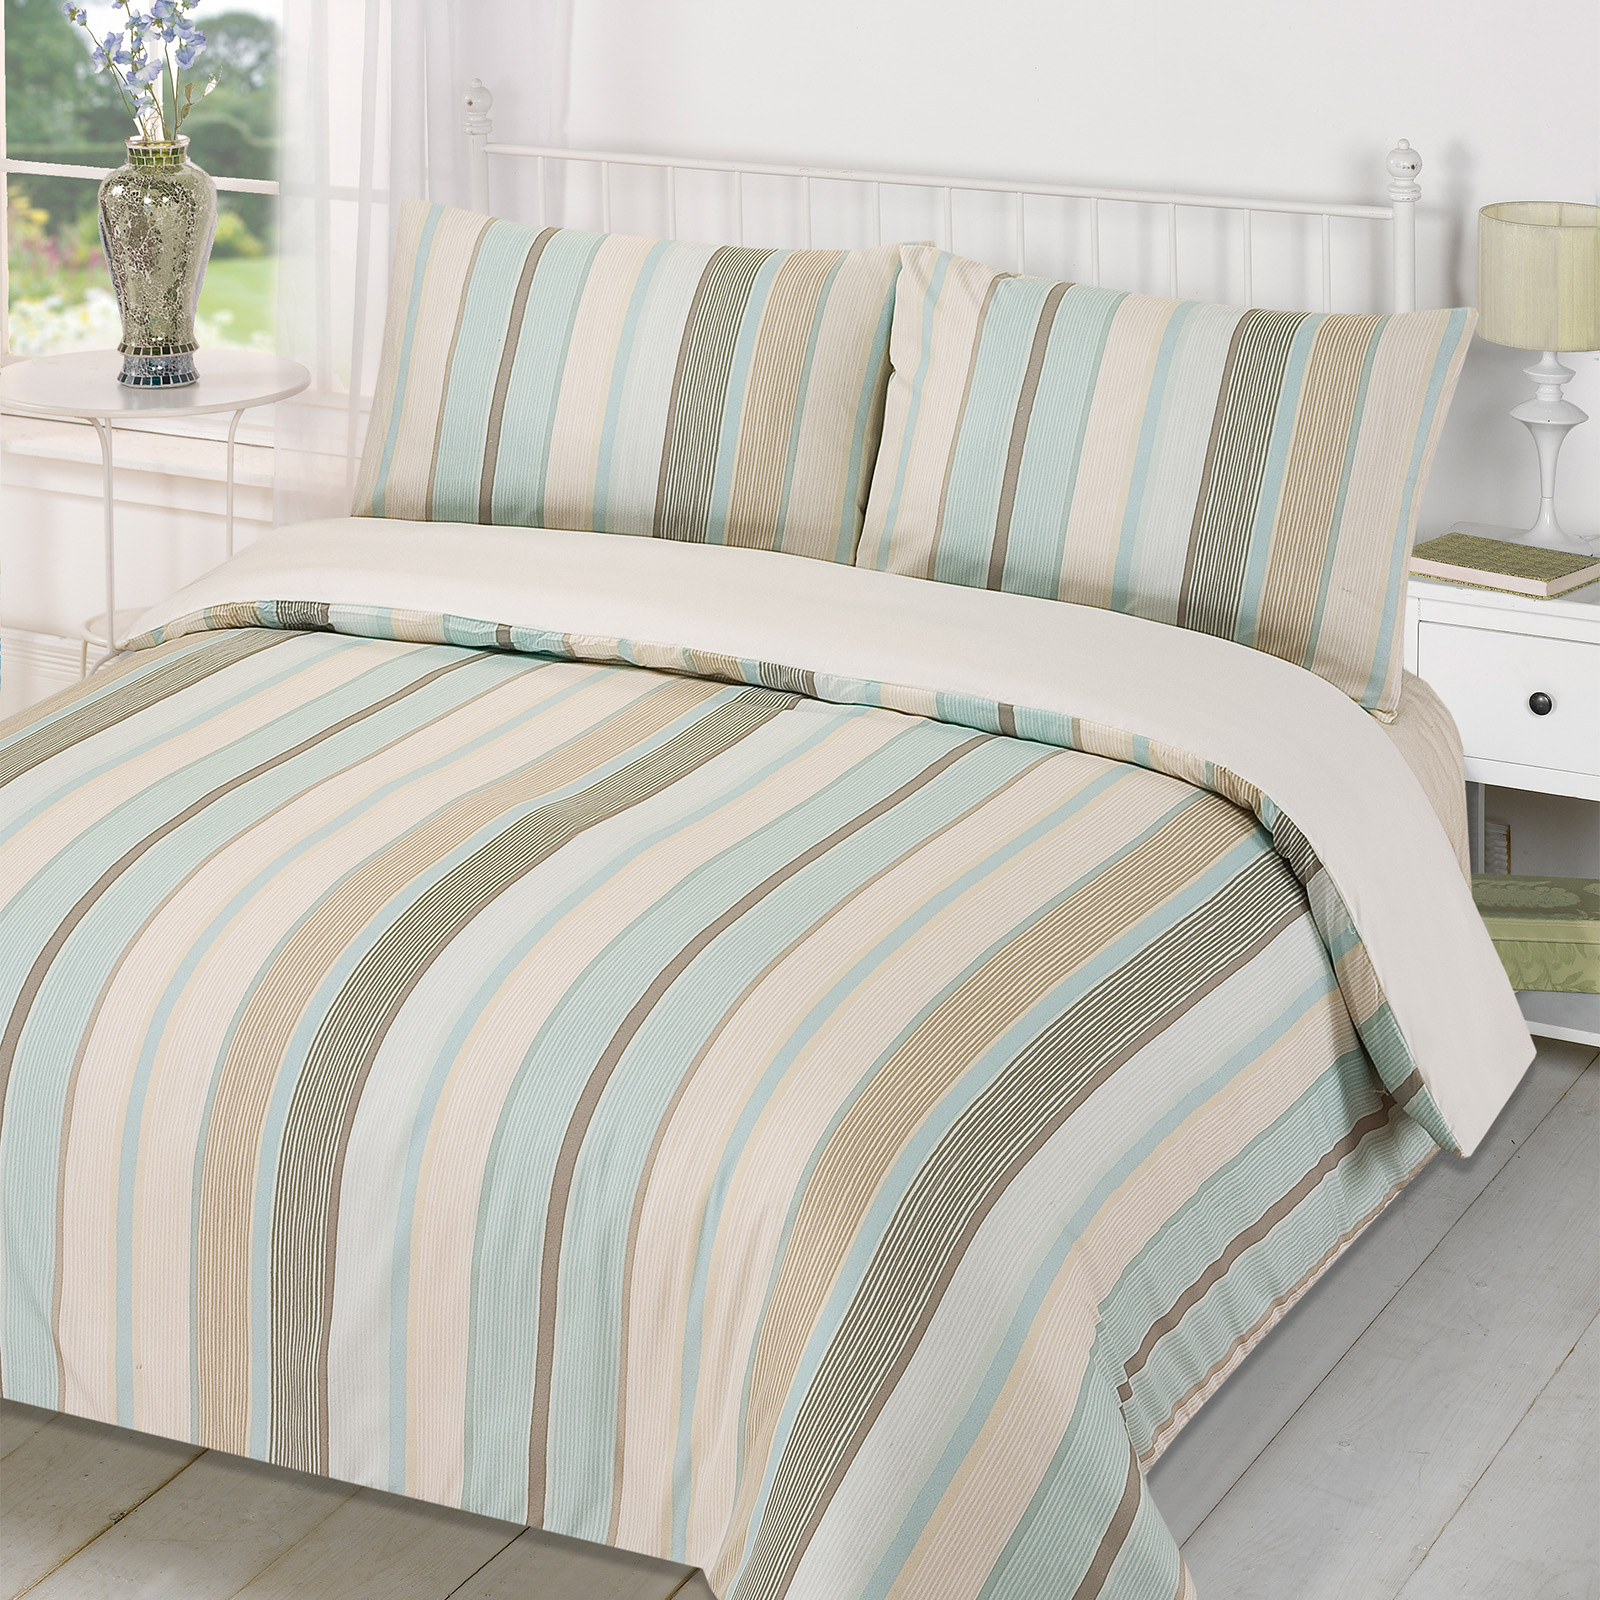 Duvet Quilt Cover with Pillowcase Bedding Set Tenby Stripe